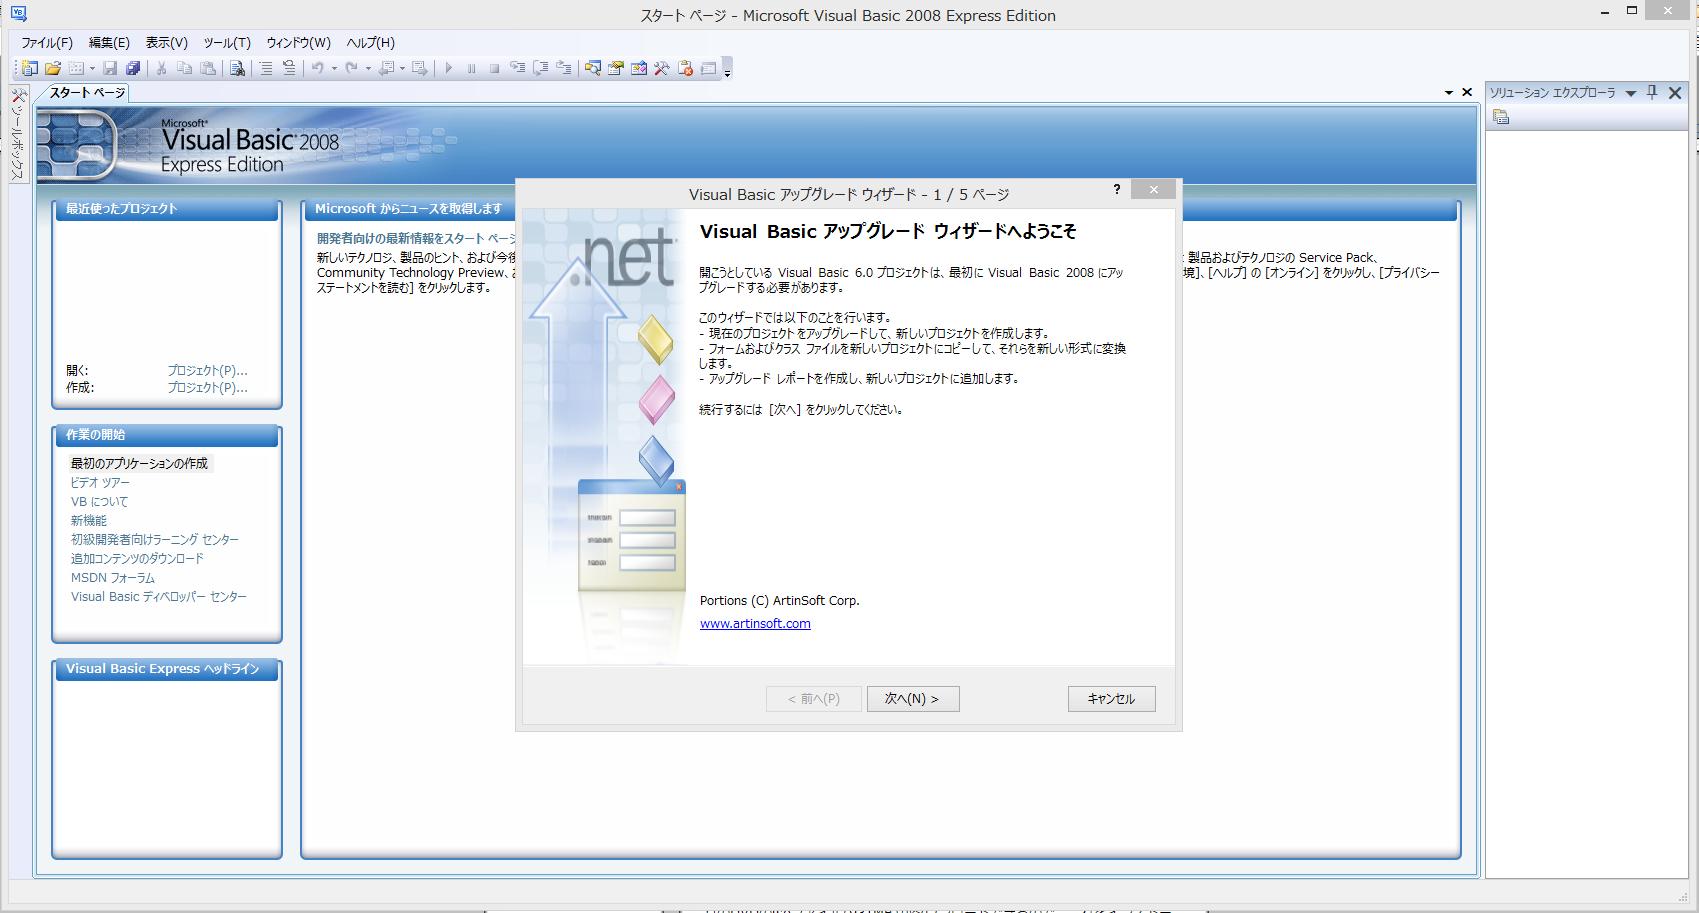 Visual Studio 2008 Express Edition VB6 プロジェクトファイル(.vbp)変換 (4/30)_a0034780_21462520.png